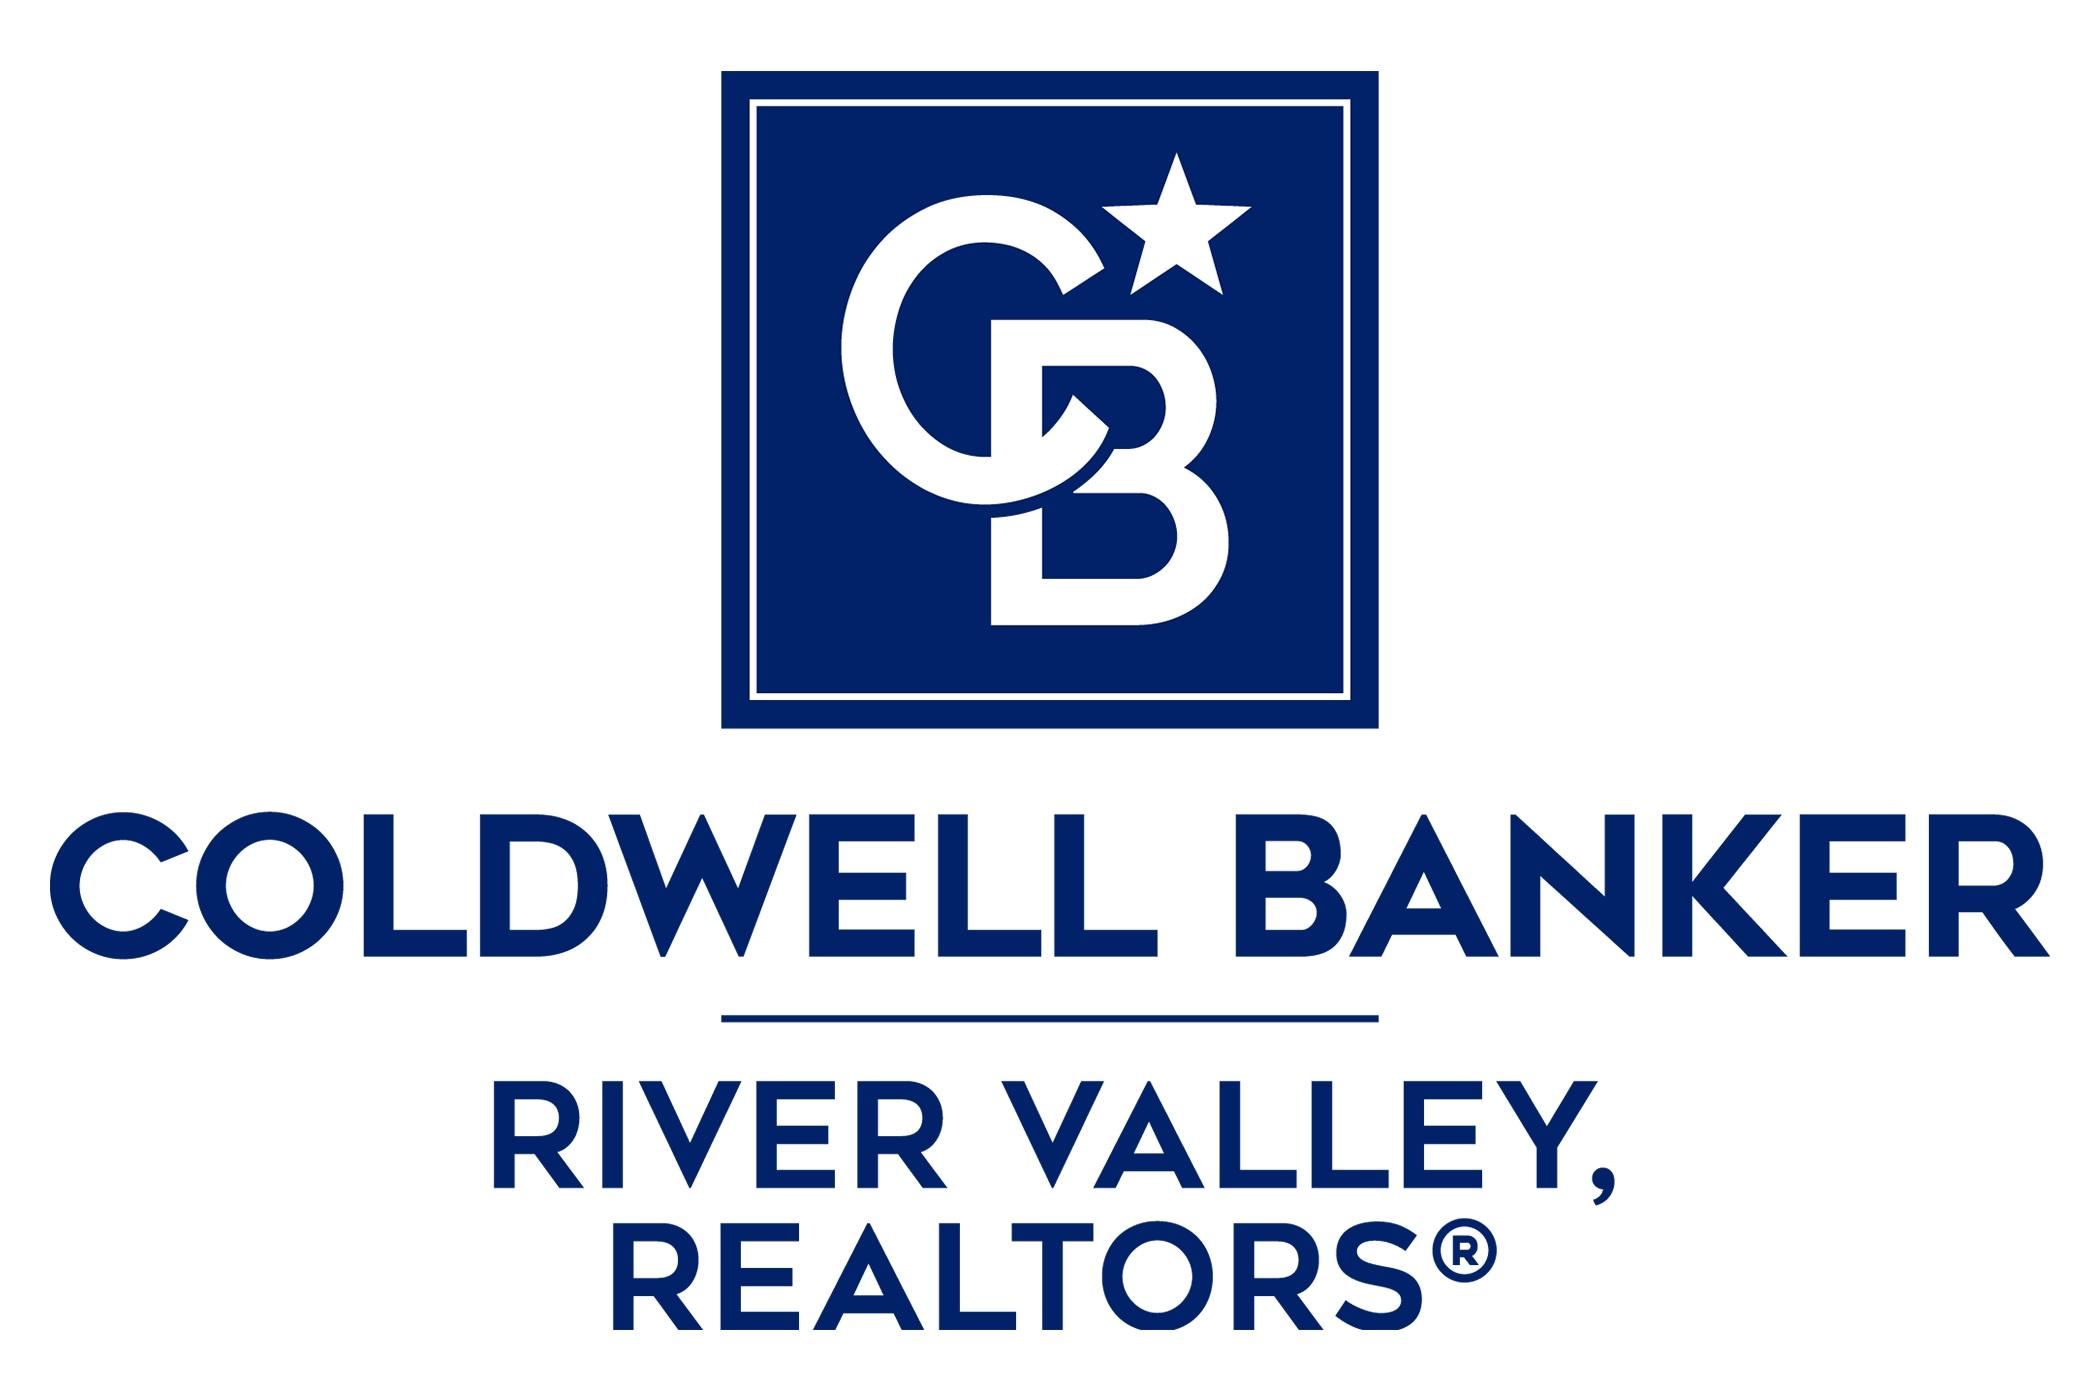 CBRV01 Logo